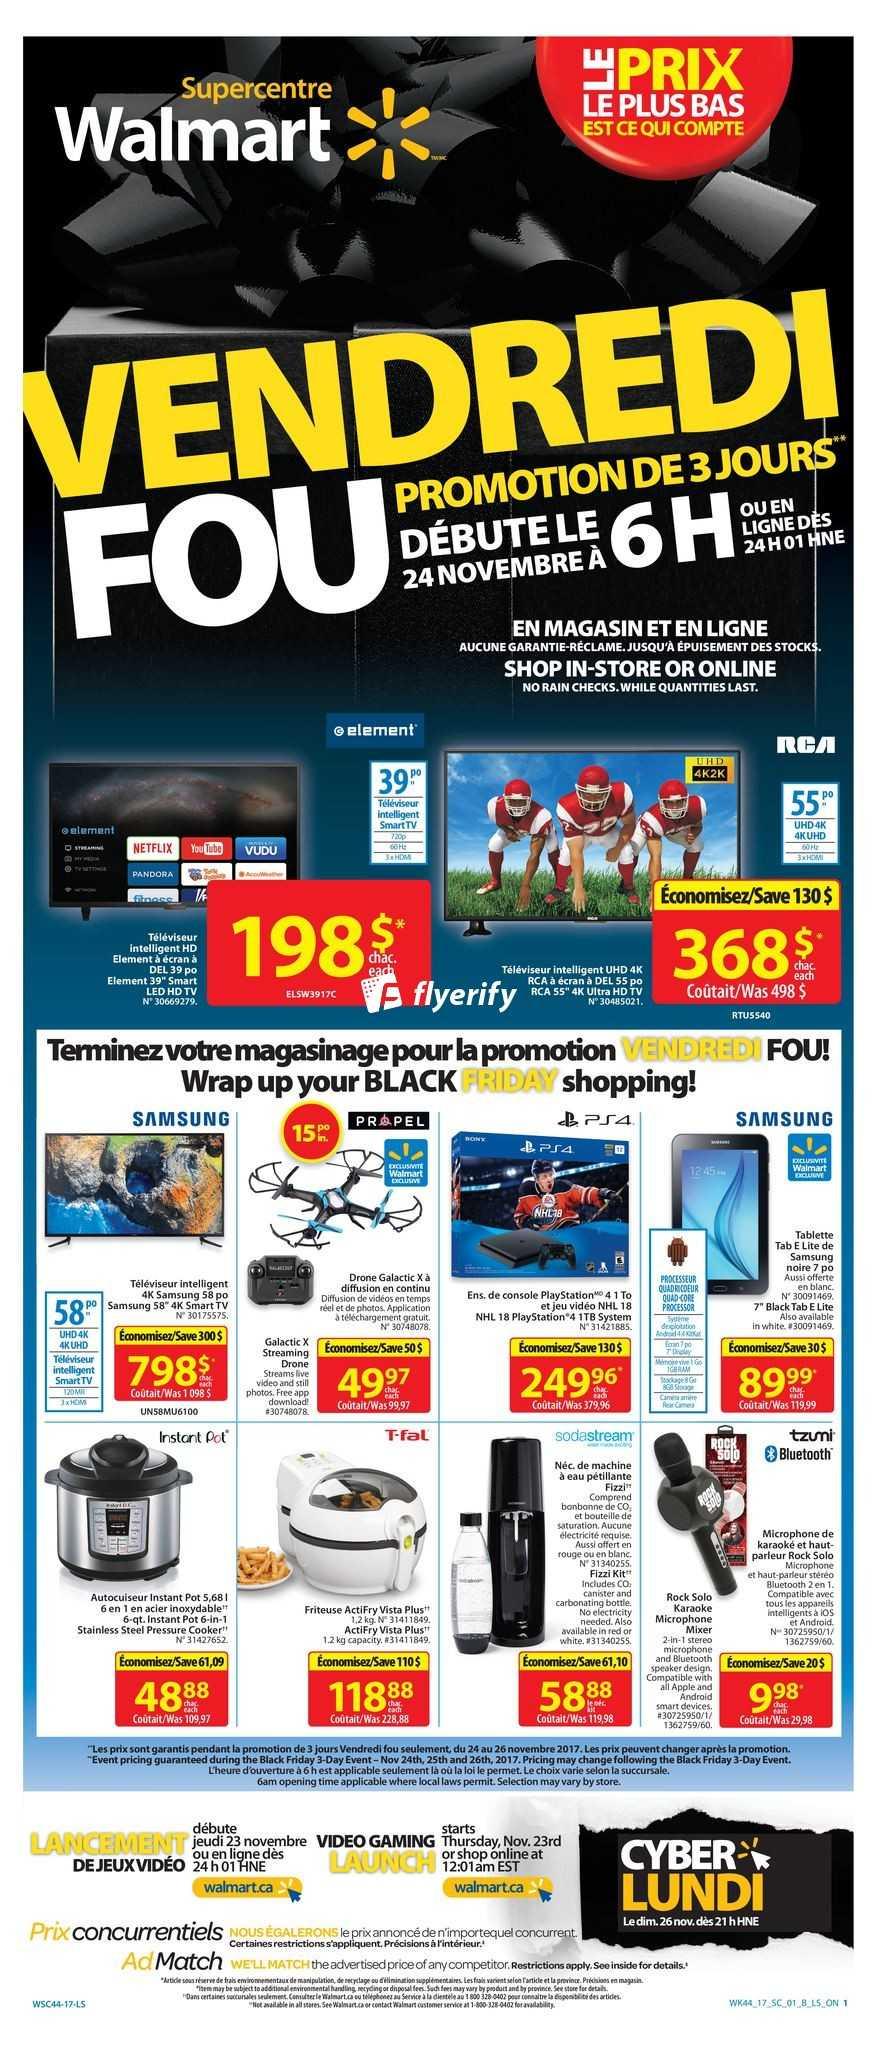 Walmart Qc Canada Black Friday Flyer November 24 To 26